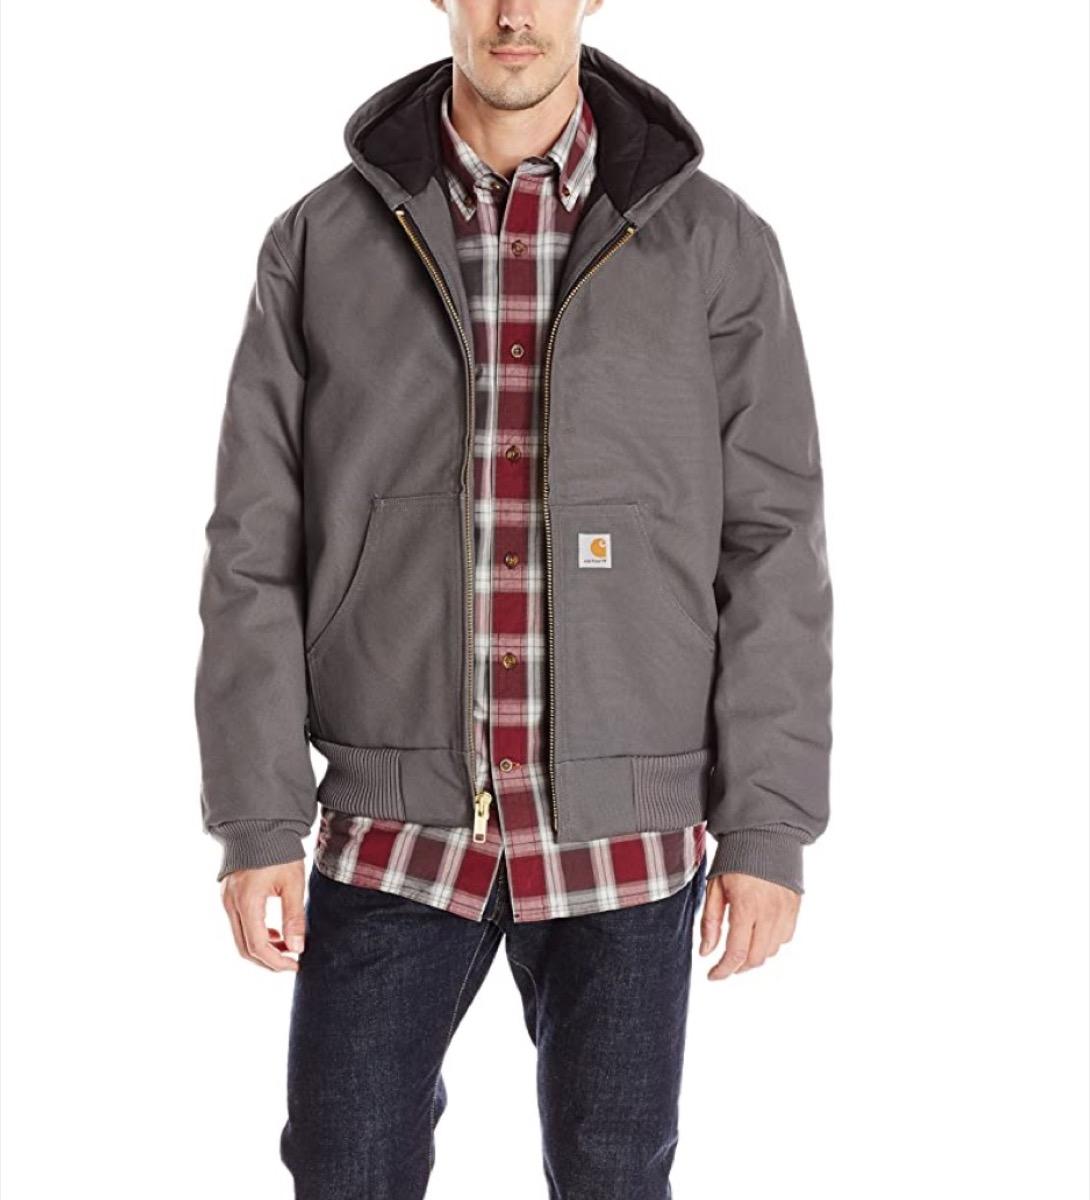 white man in gray carhartt jacket